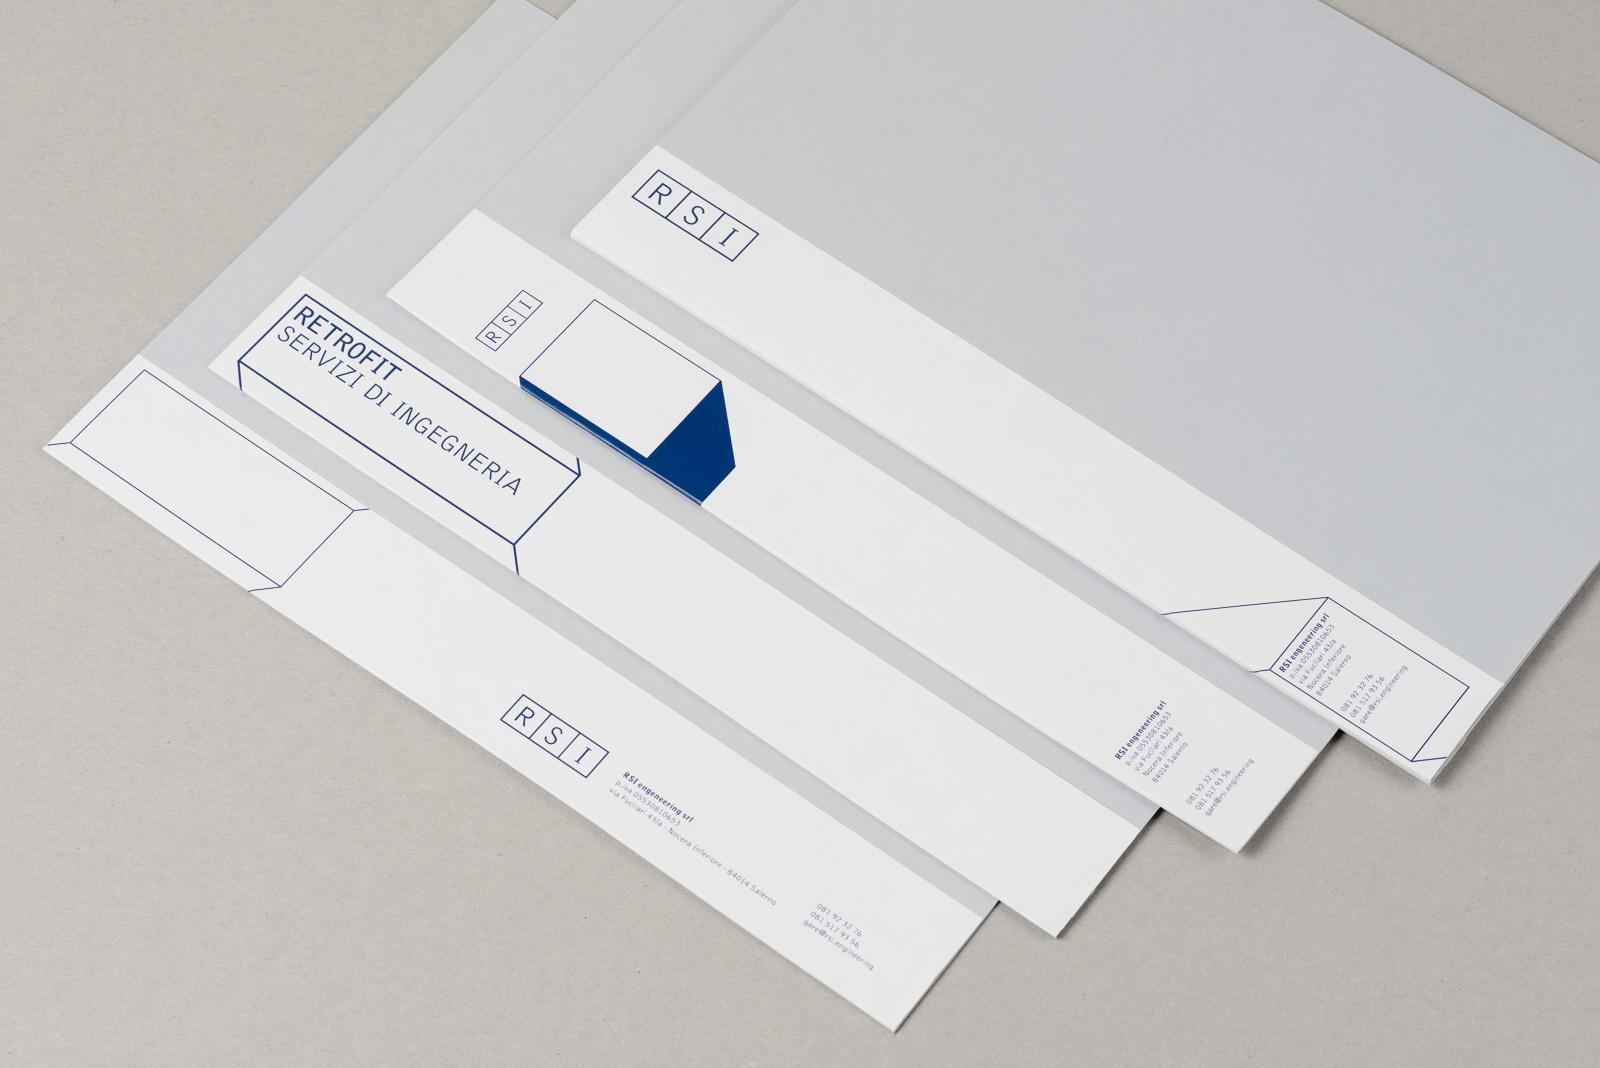 forzastudio-rsi-graphic-design-etichette-01